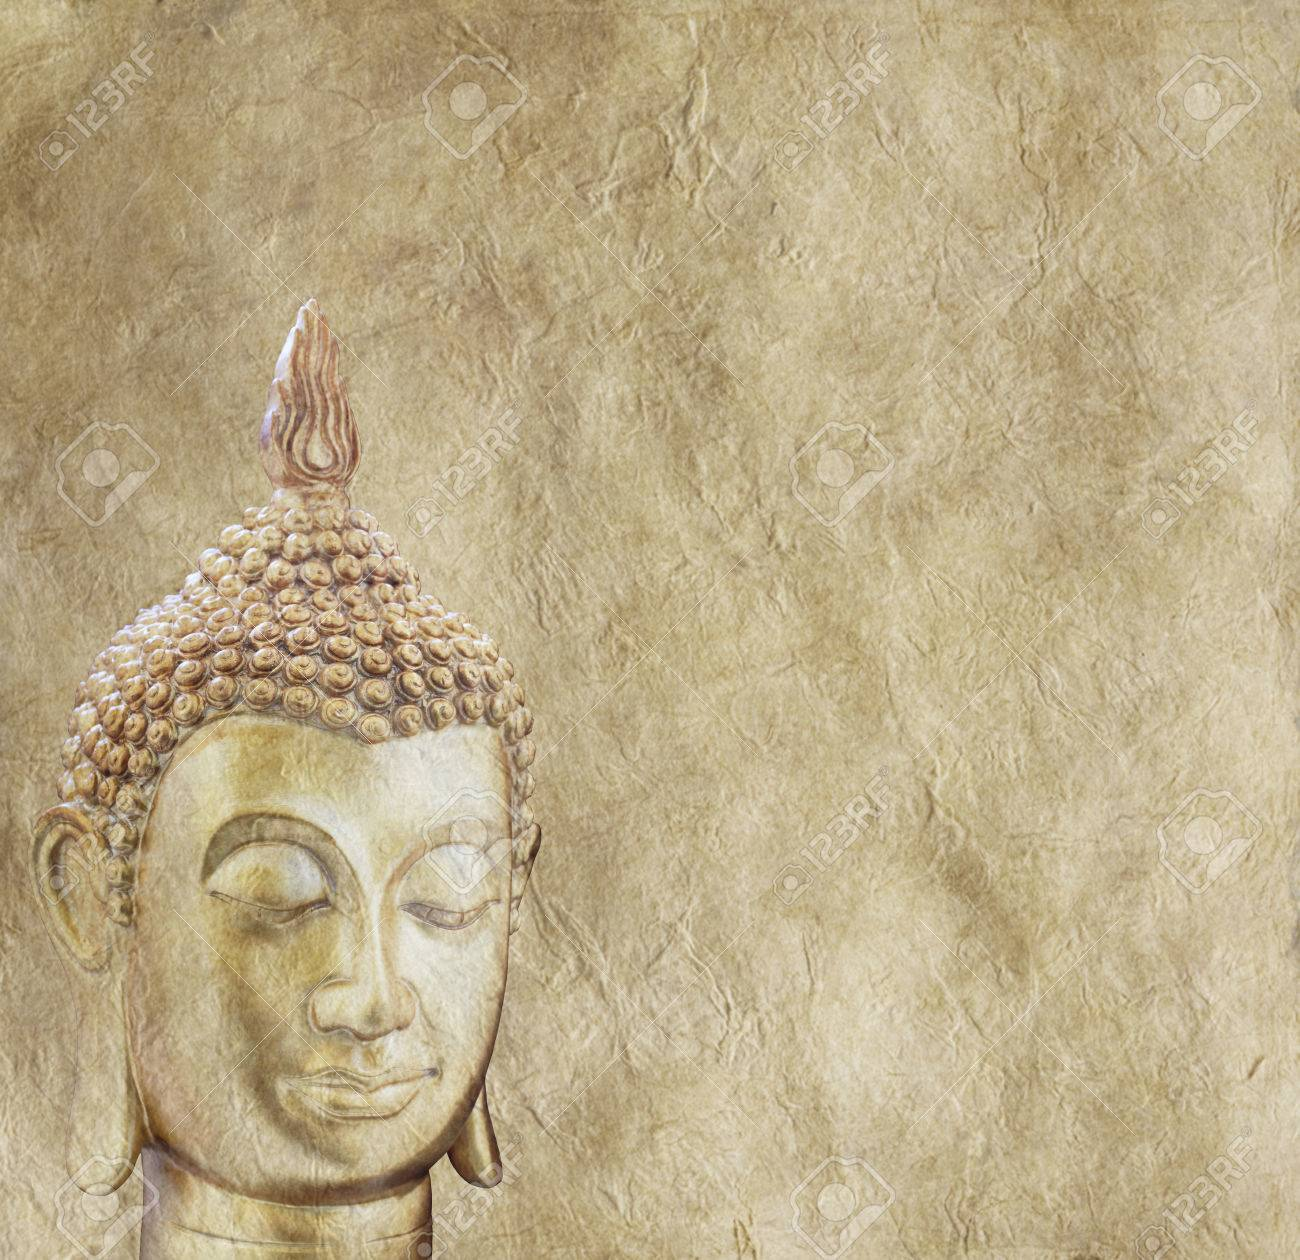 Budhha on Parchment Background Poster Stock Photo - 29022509